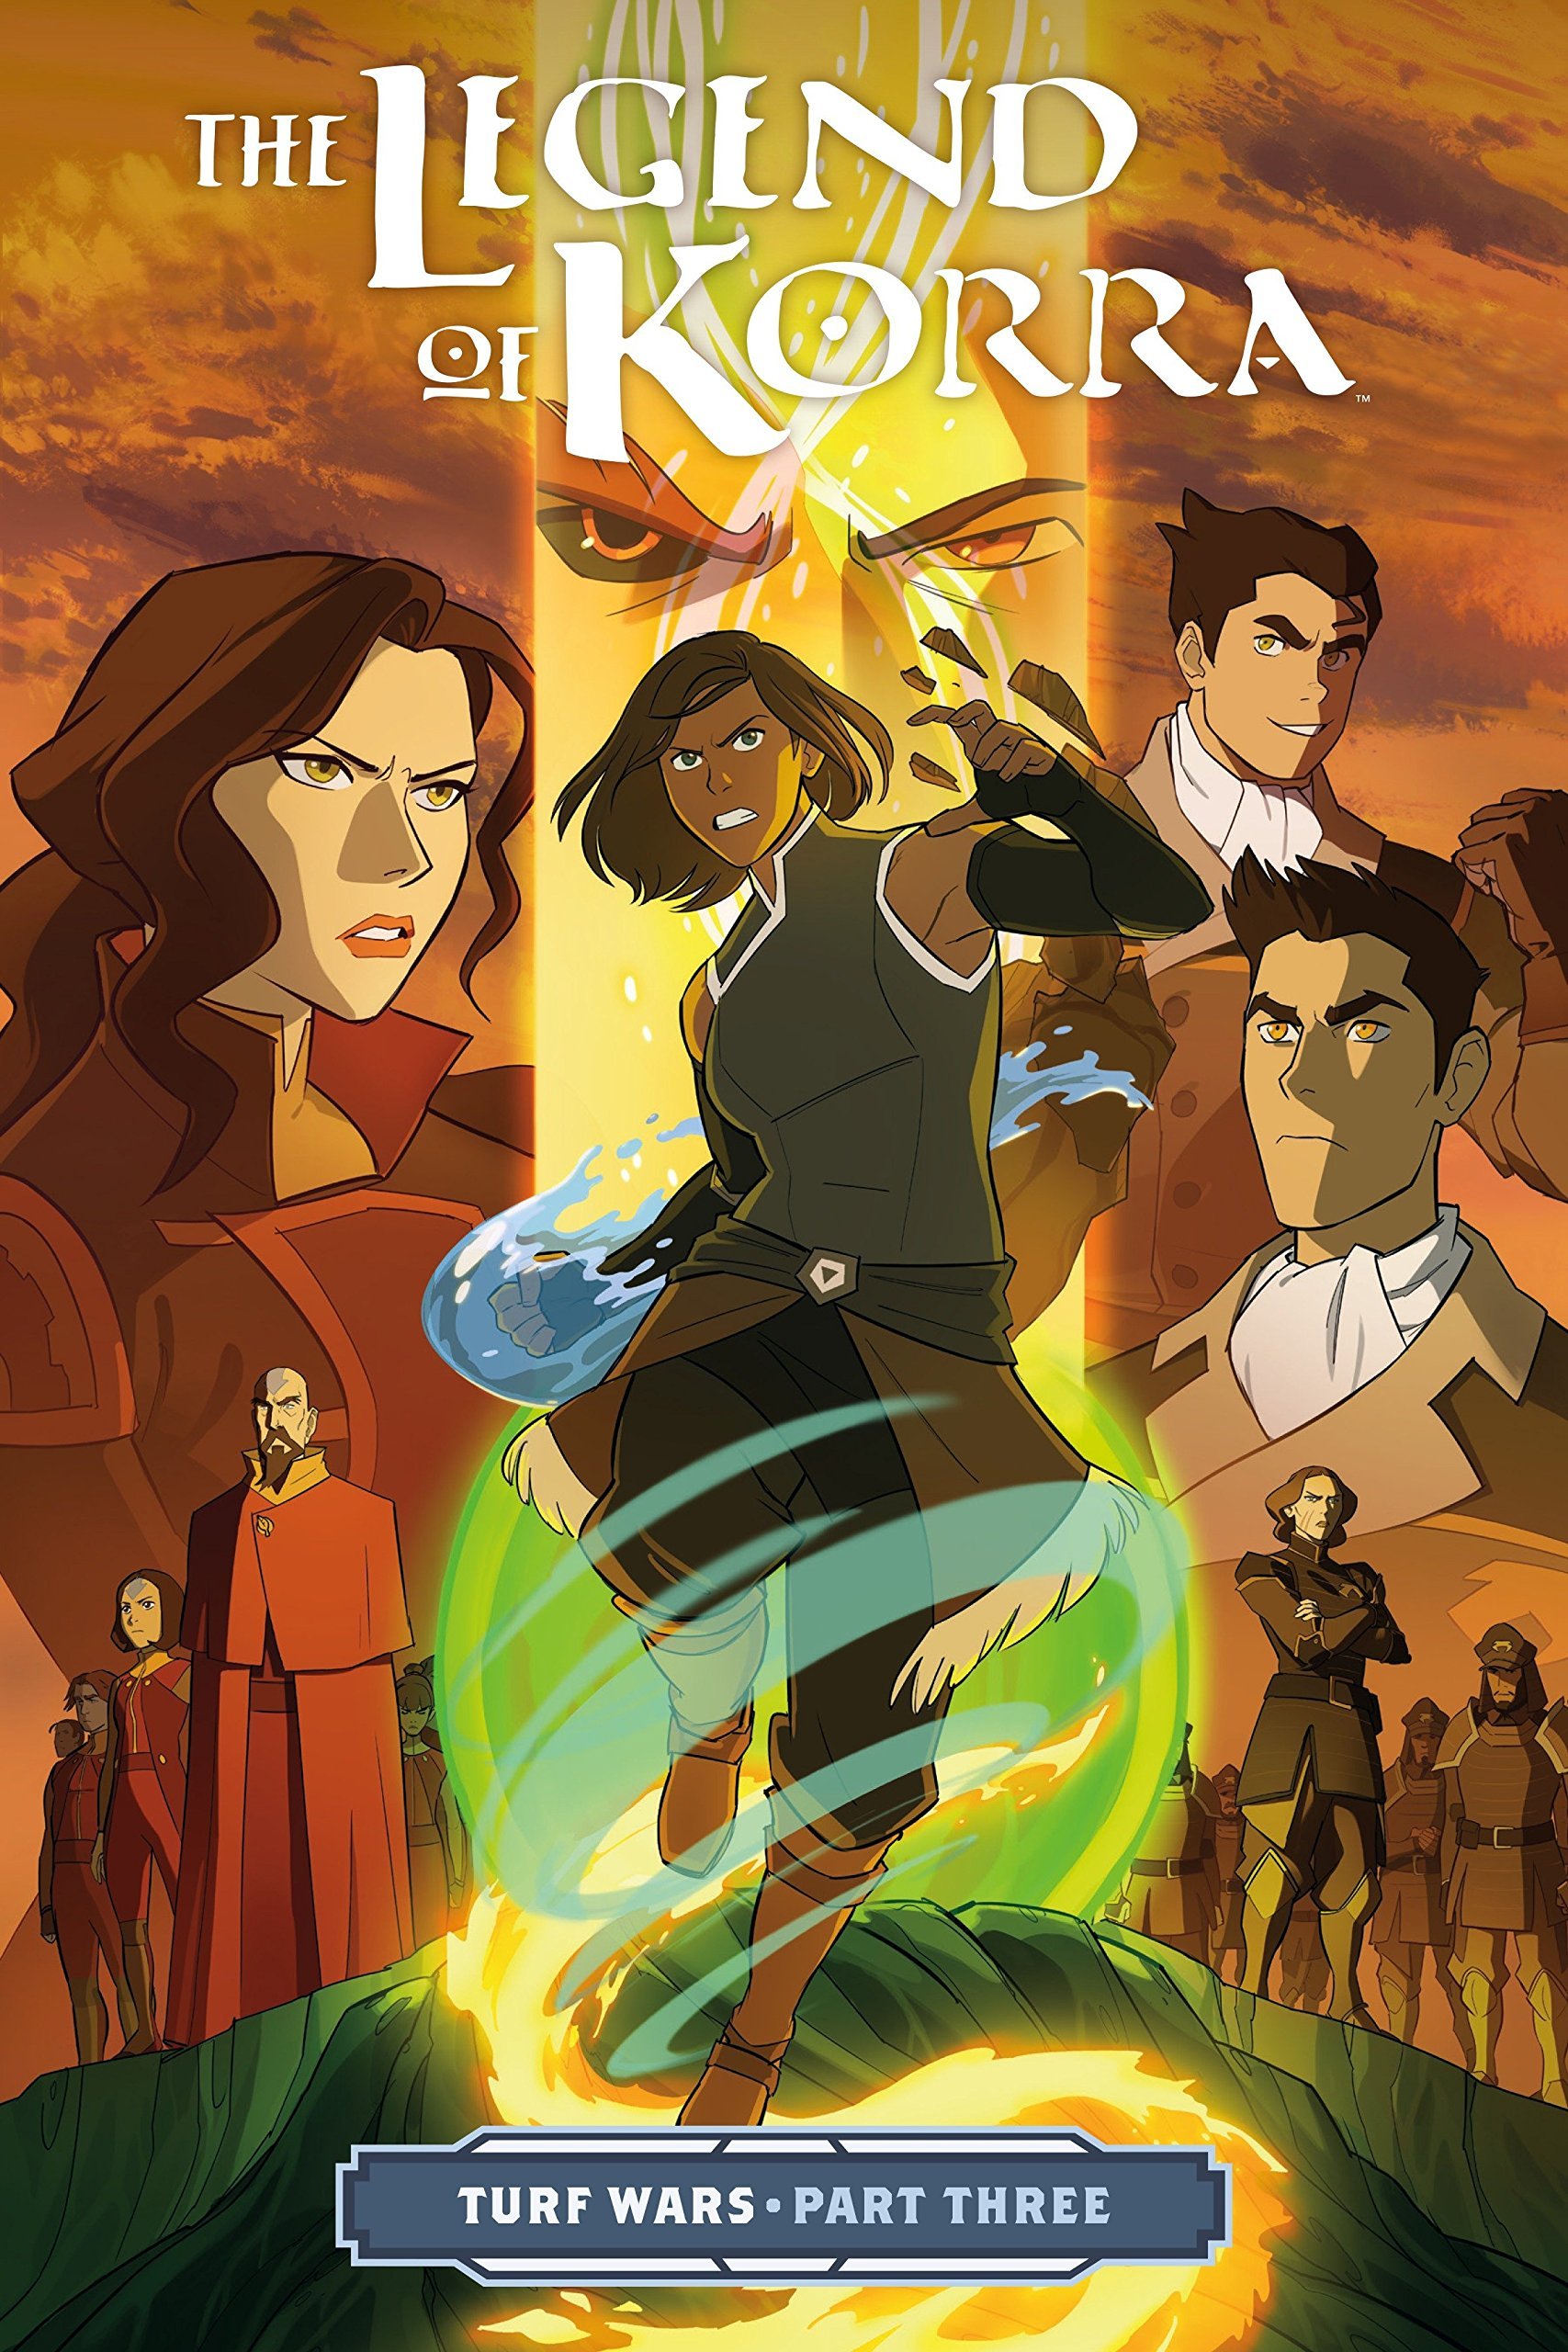 The Legend of Korra: Turf Wars Part Three : DiMartino, Michael Dante, Koh, Irene, Ng, Killian: Amazon.fr: Livres